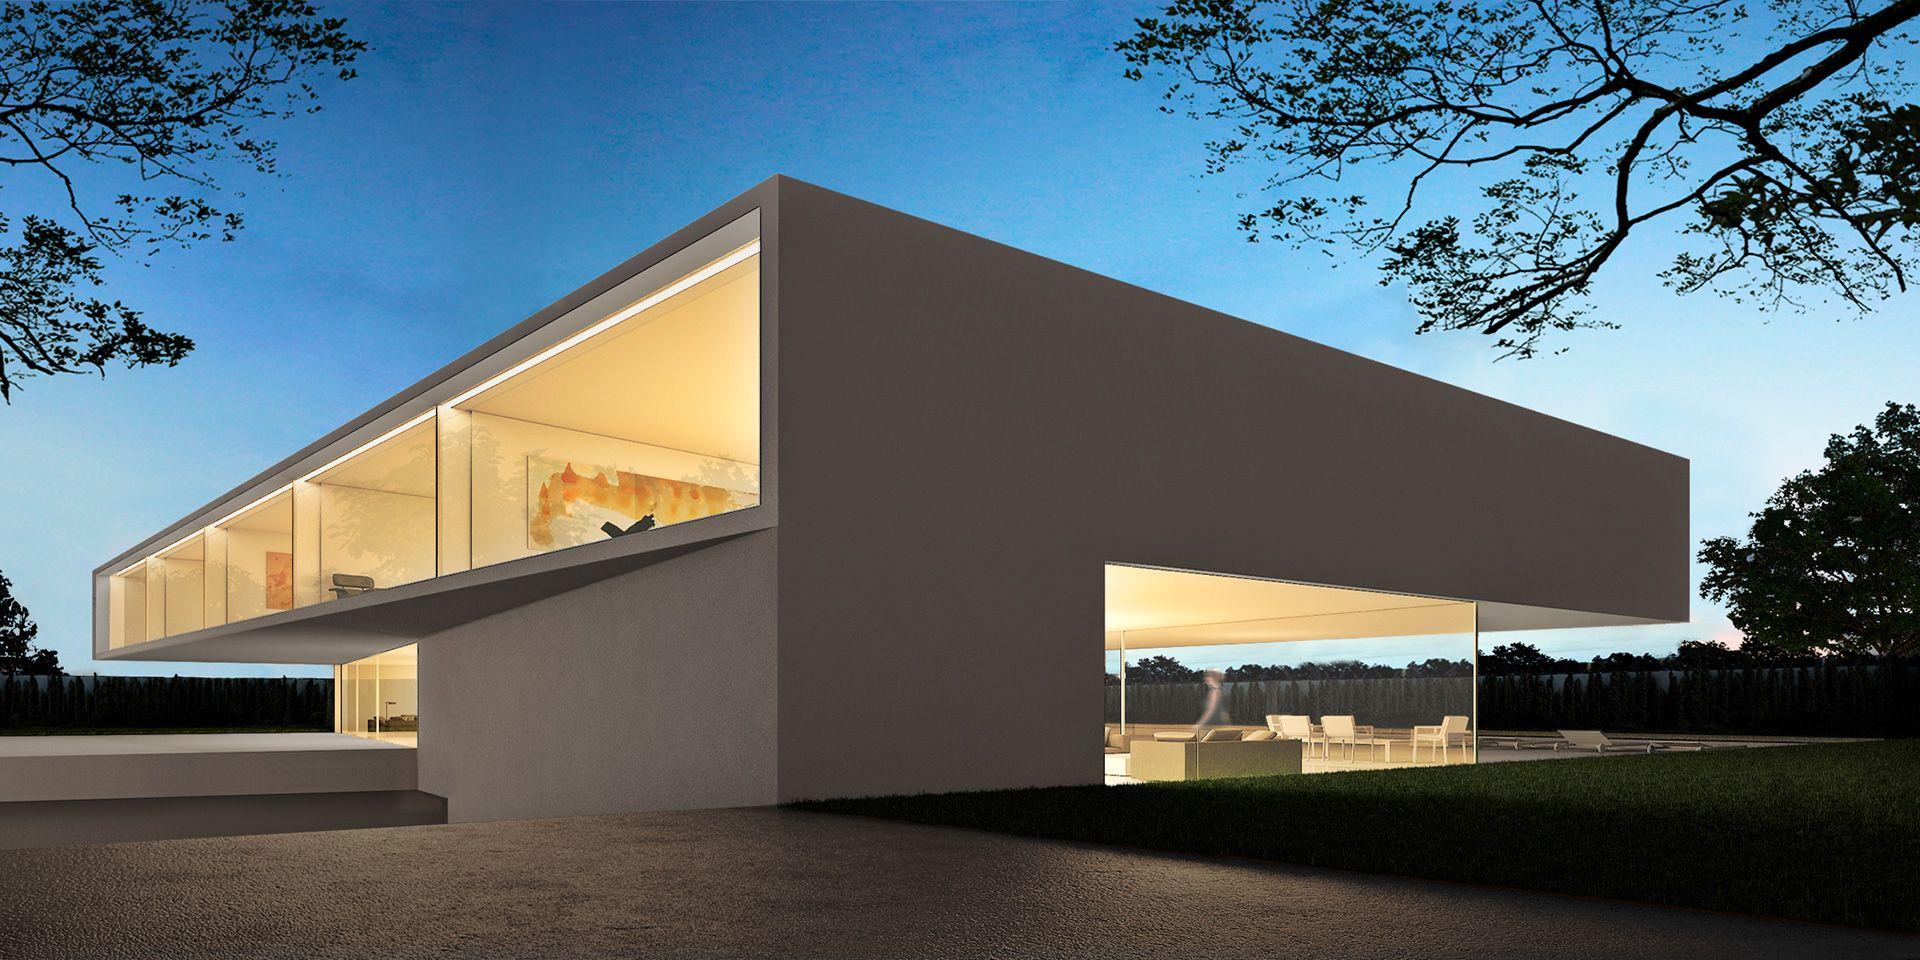 Mdj fran silvestre arquitectos valencia 002 houses for Arquitectos valencia